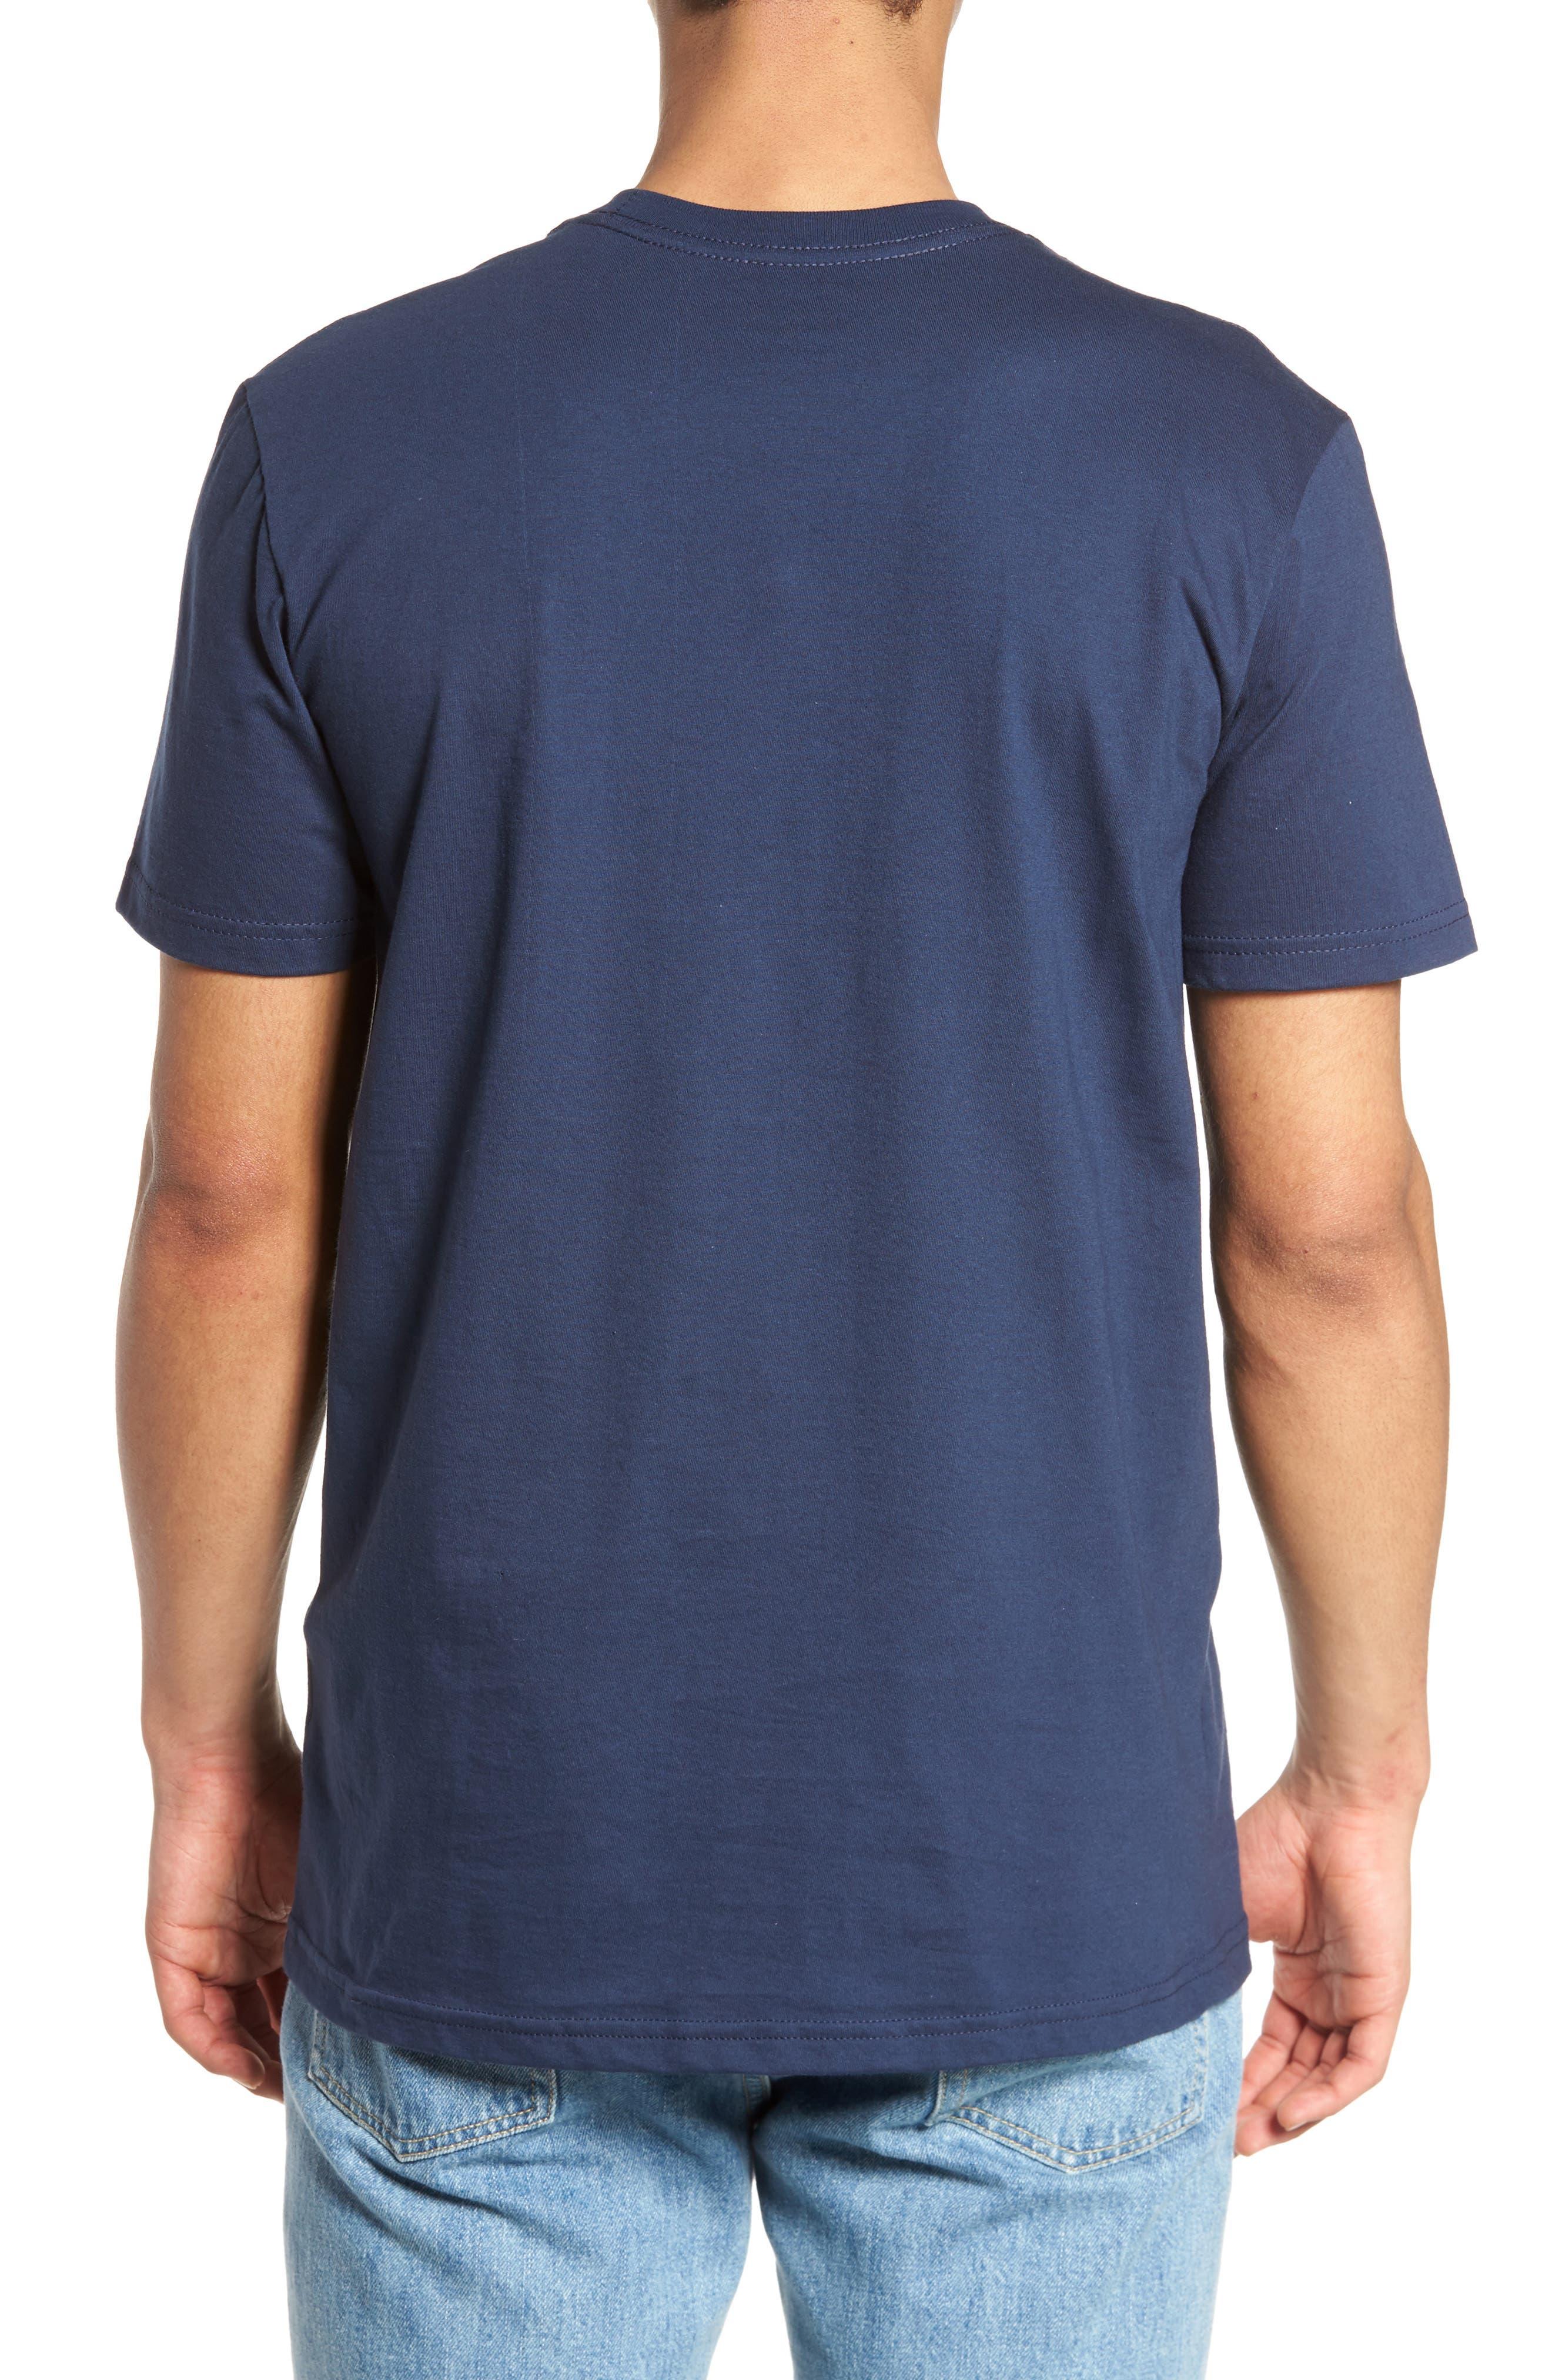 Glitch Motors T-Shirt,                             Alternate thumbnail 2, color,                             Federal Blue